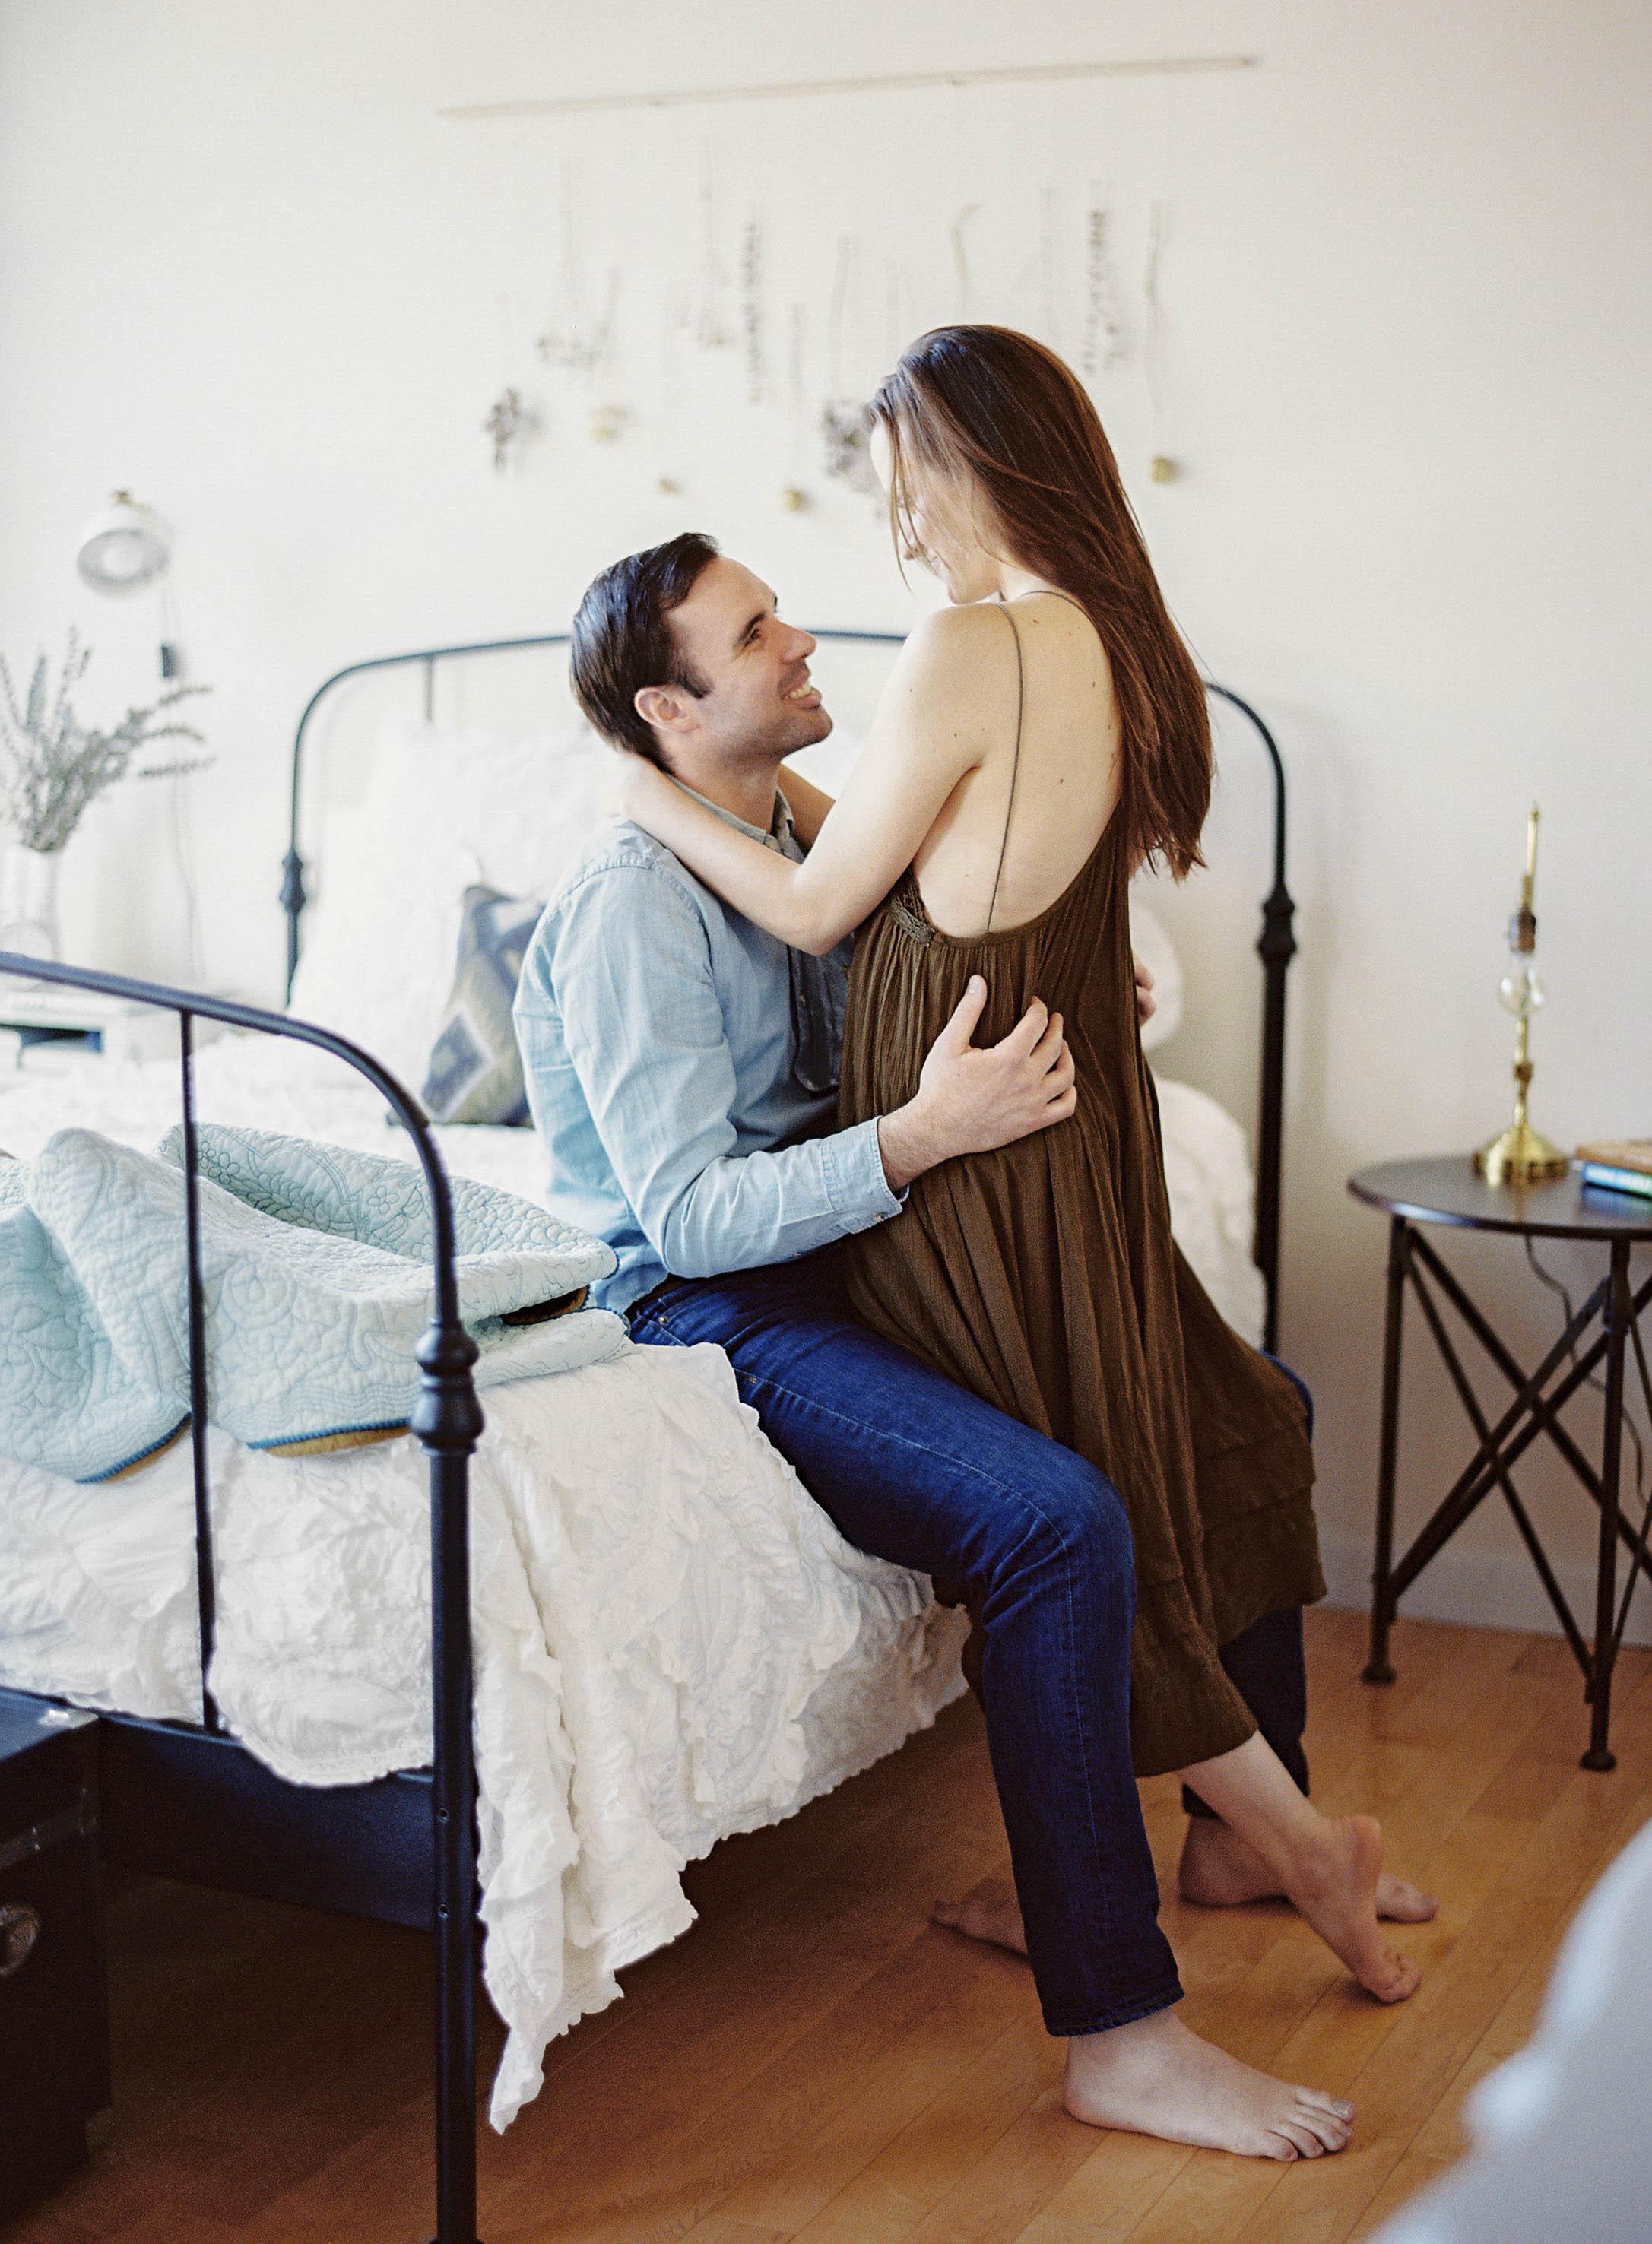 Meghan Mehan Photography | Fine Art Film Wedding Photographer | California | San Francisco | Napa | Sonoma | Santa Barbara | Big Sur | Los Angeles | Destination Wedding Photographer 038.jpg